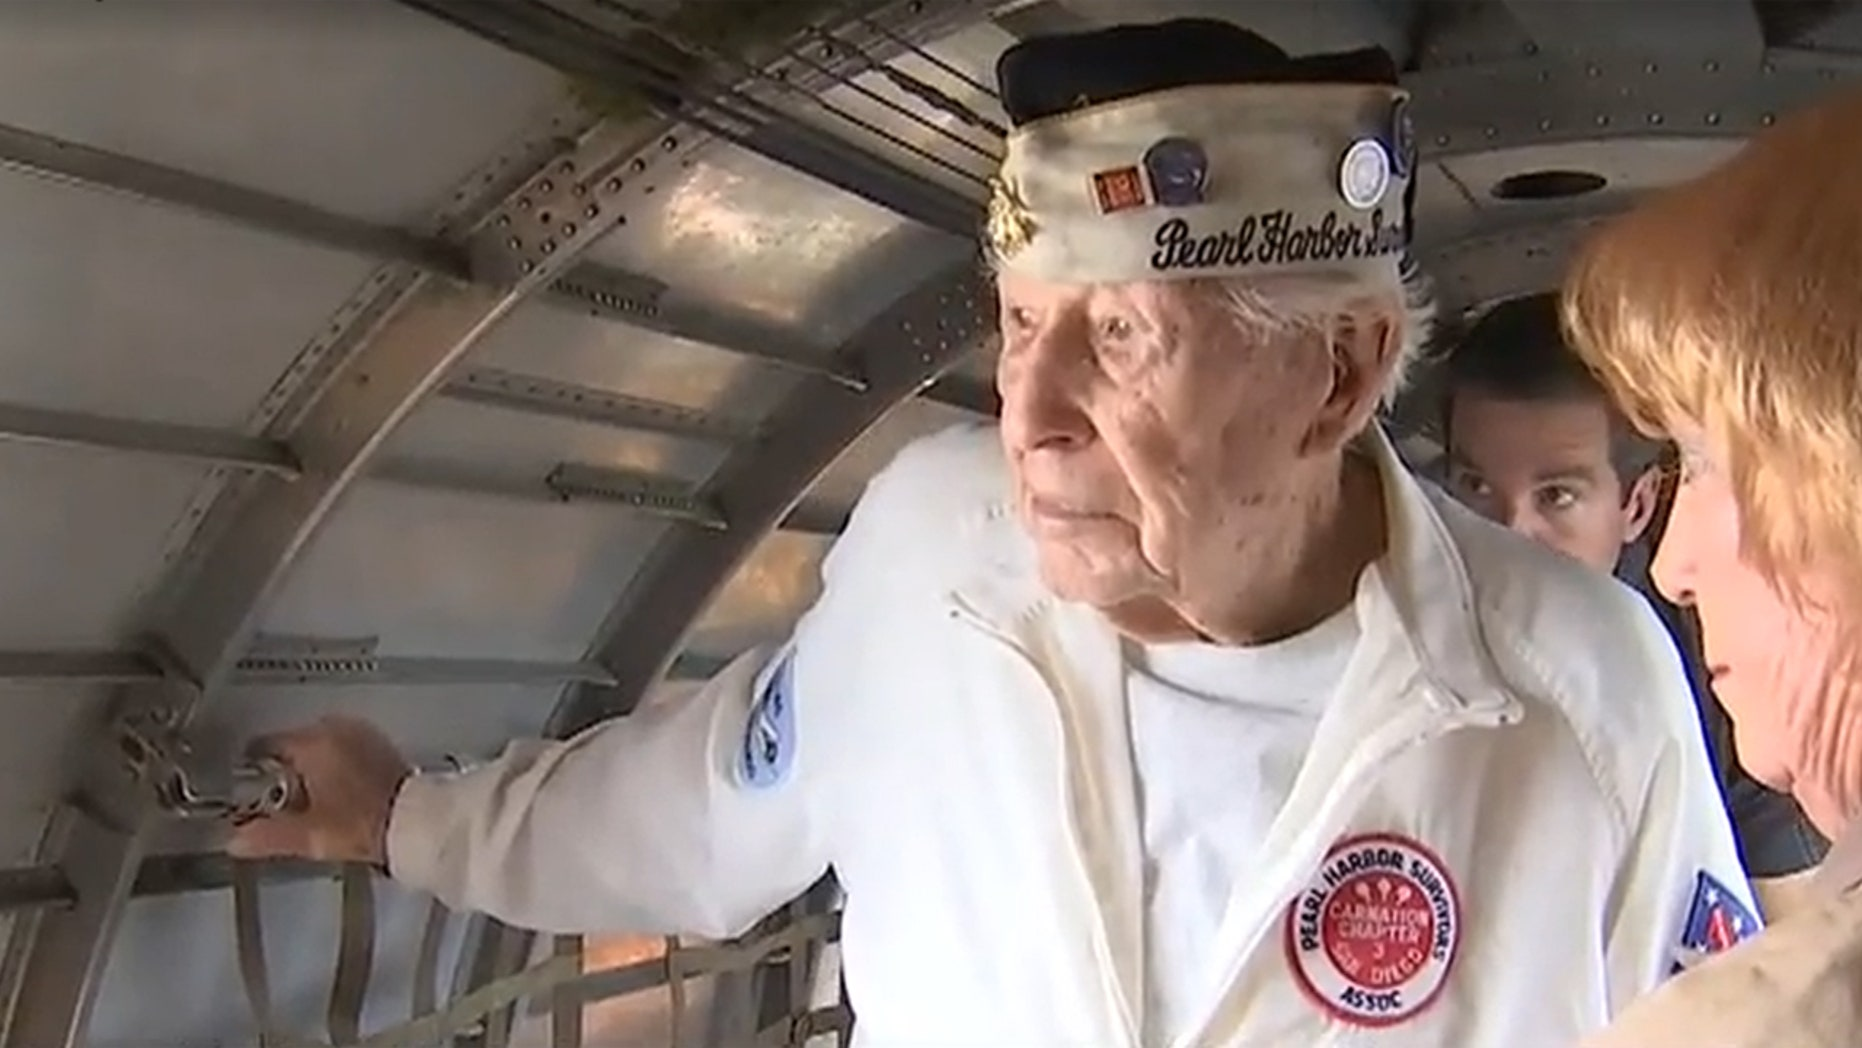 On his birthday, WWII veteran Eugene Leonard got to fly in a B-17 bomber.